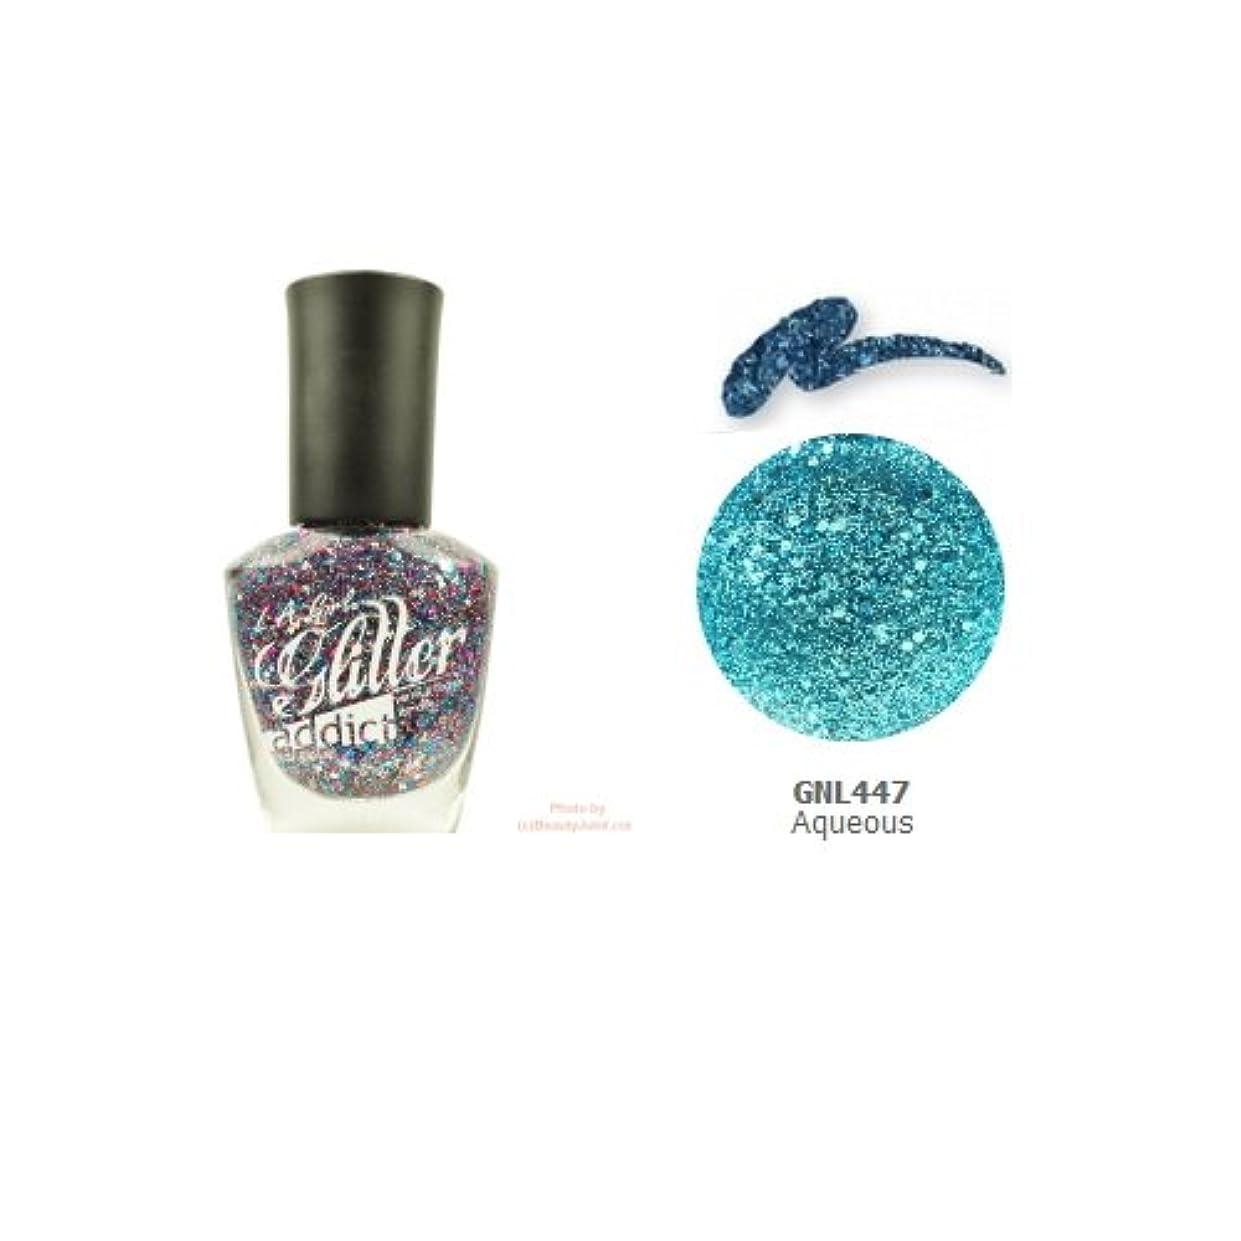 怪物周術期概念LA GIRL Glitter Addict Polish - Aqueous (並行輸入品)